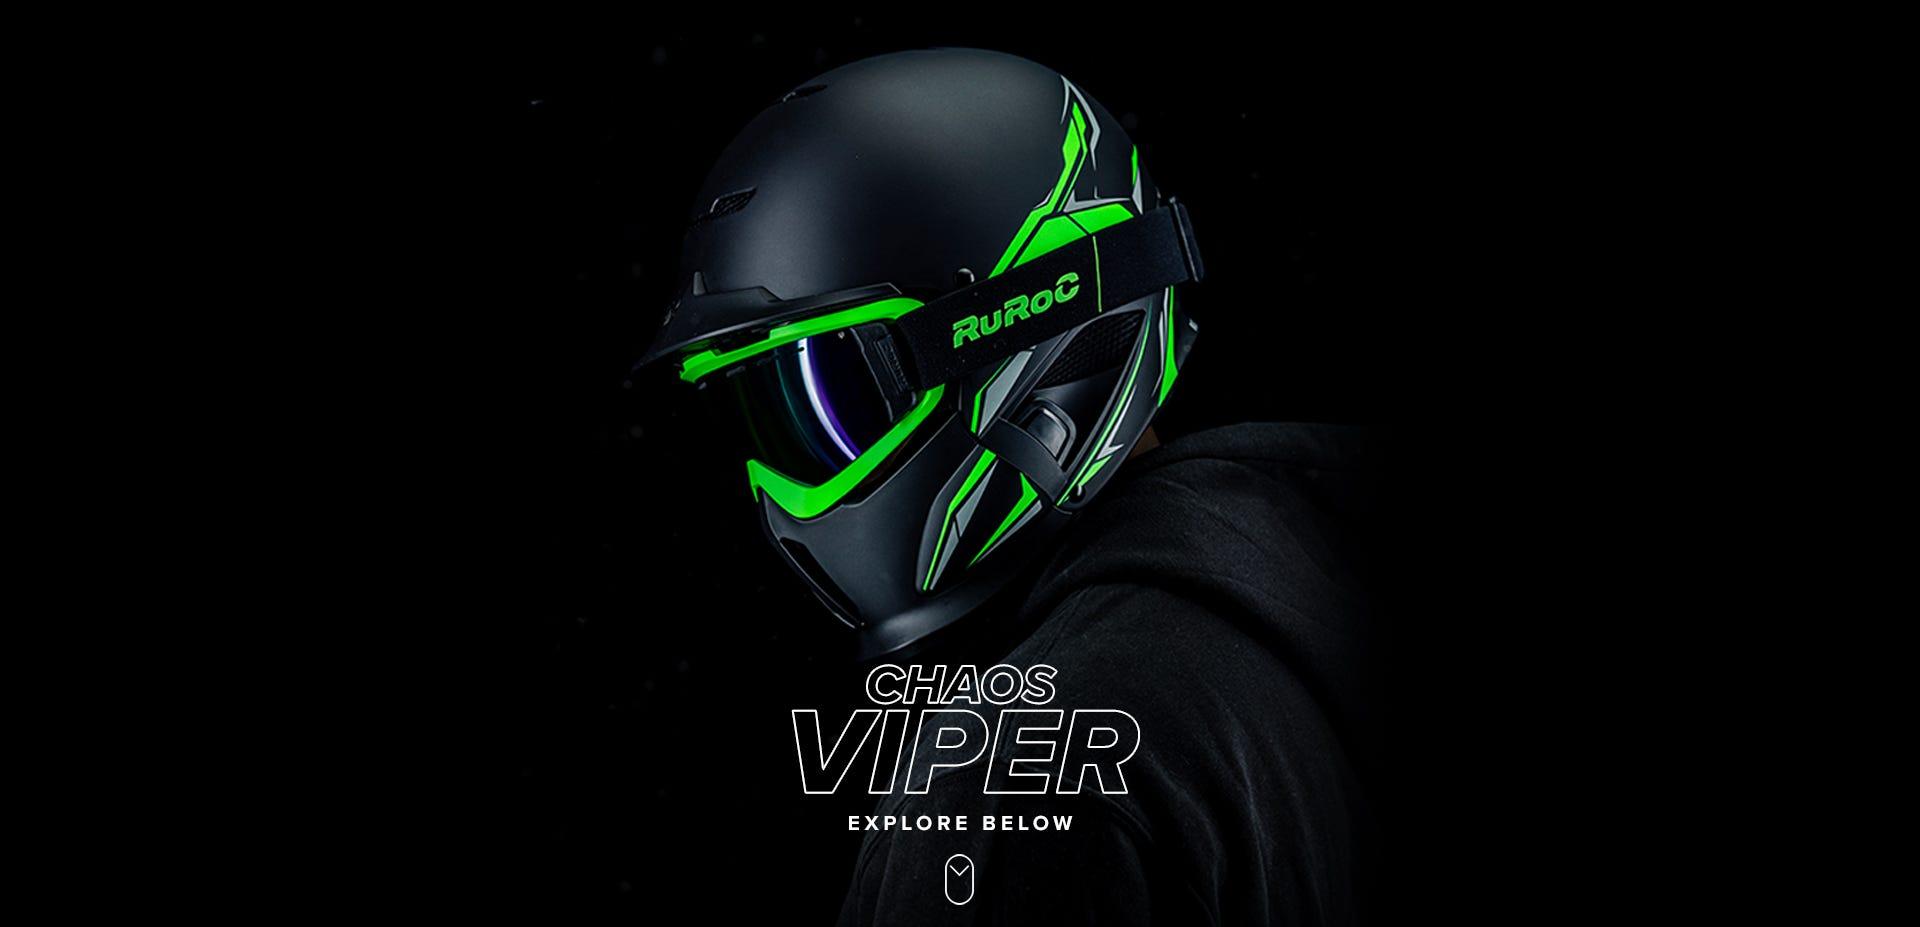 rg1-dx---chaos-viper---top-banner_1.jpg